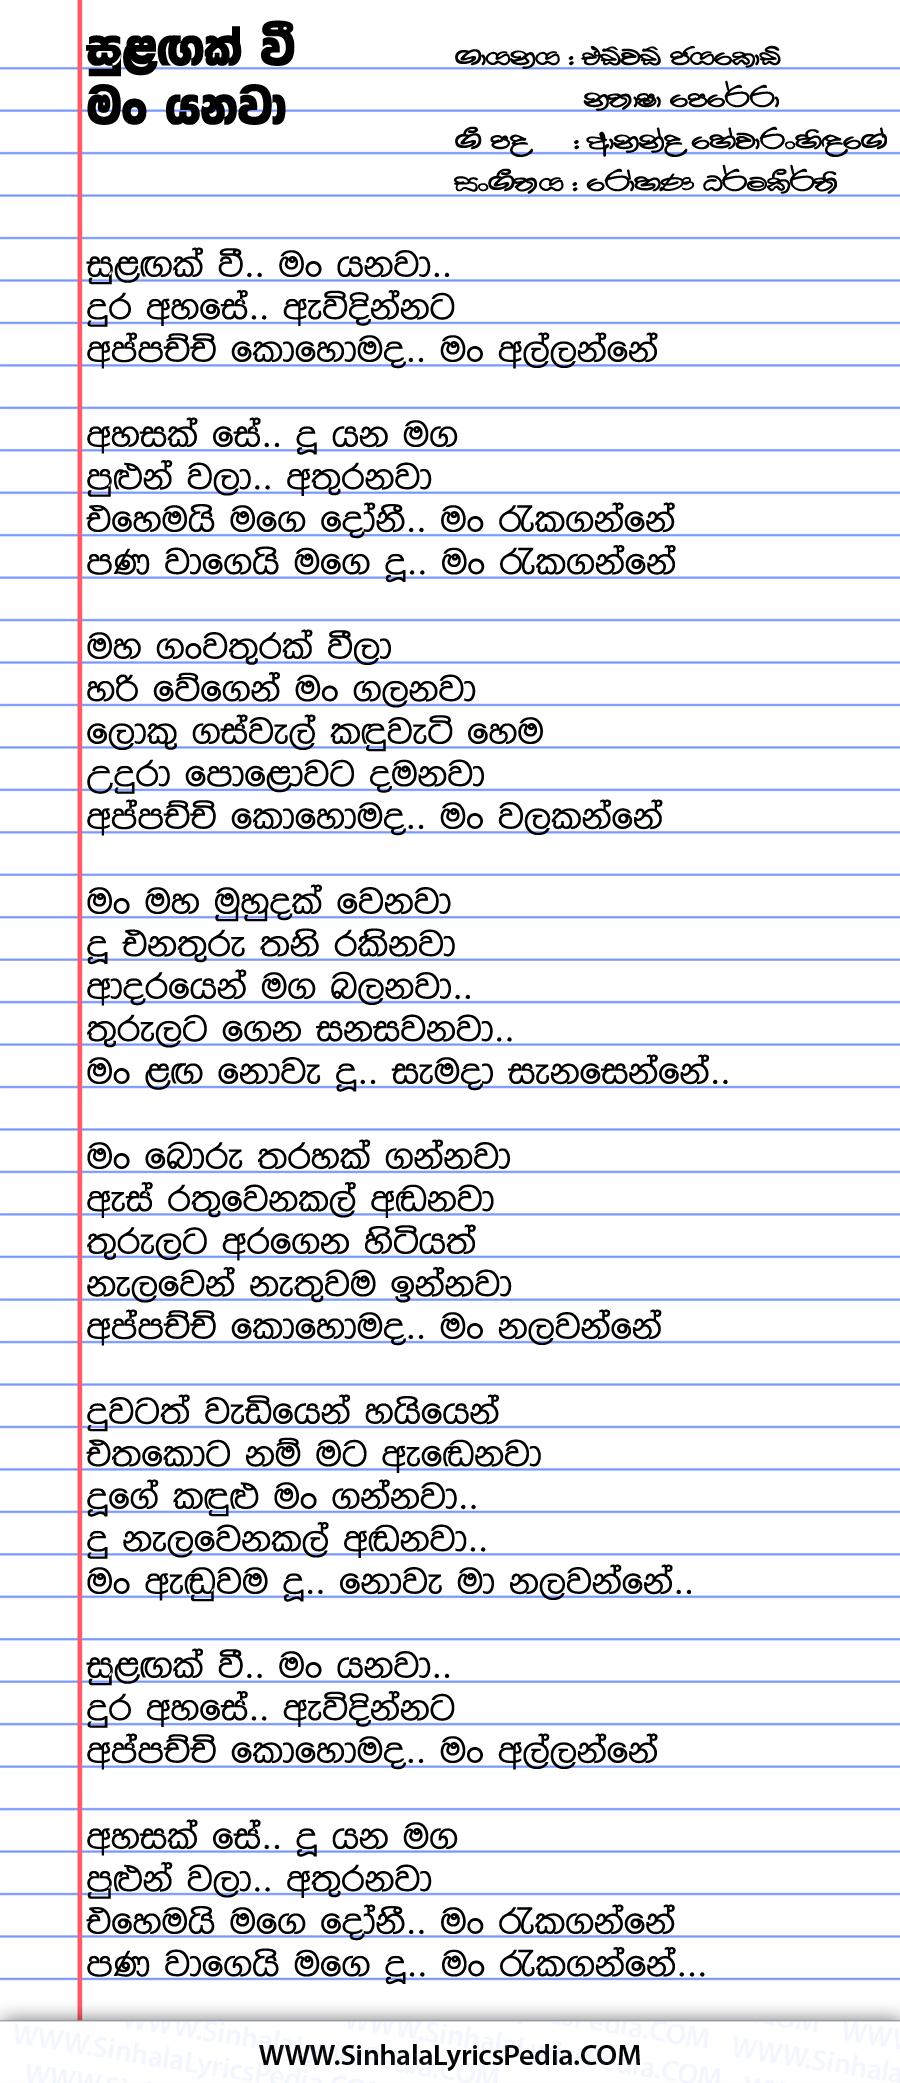 Sulagak Wee Mama Yanawa Song Lyrics